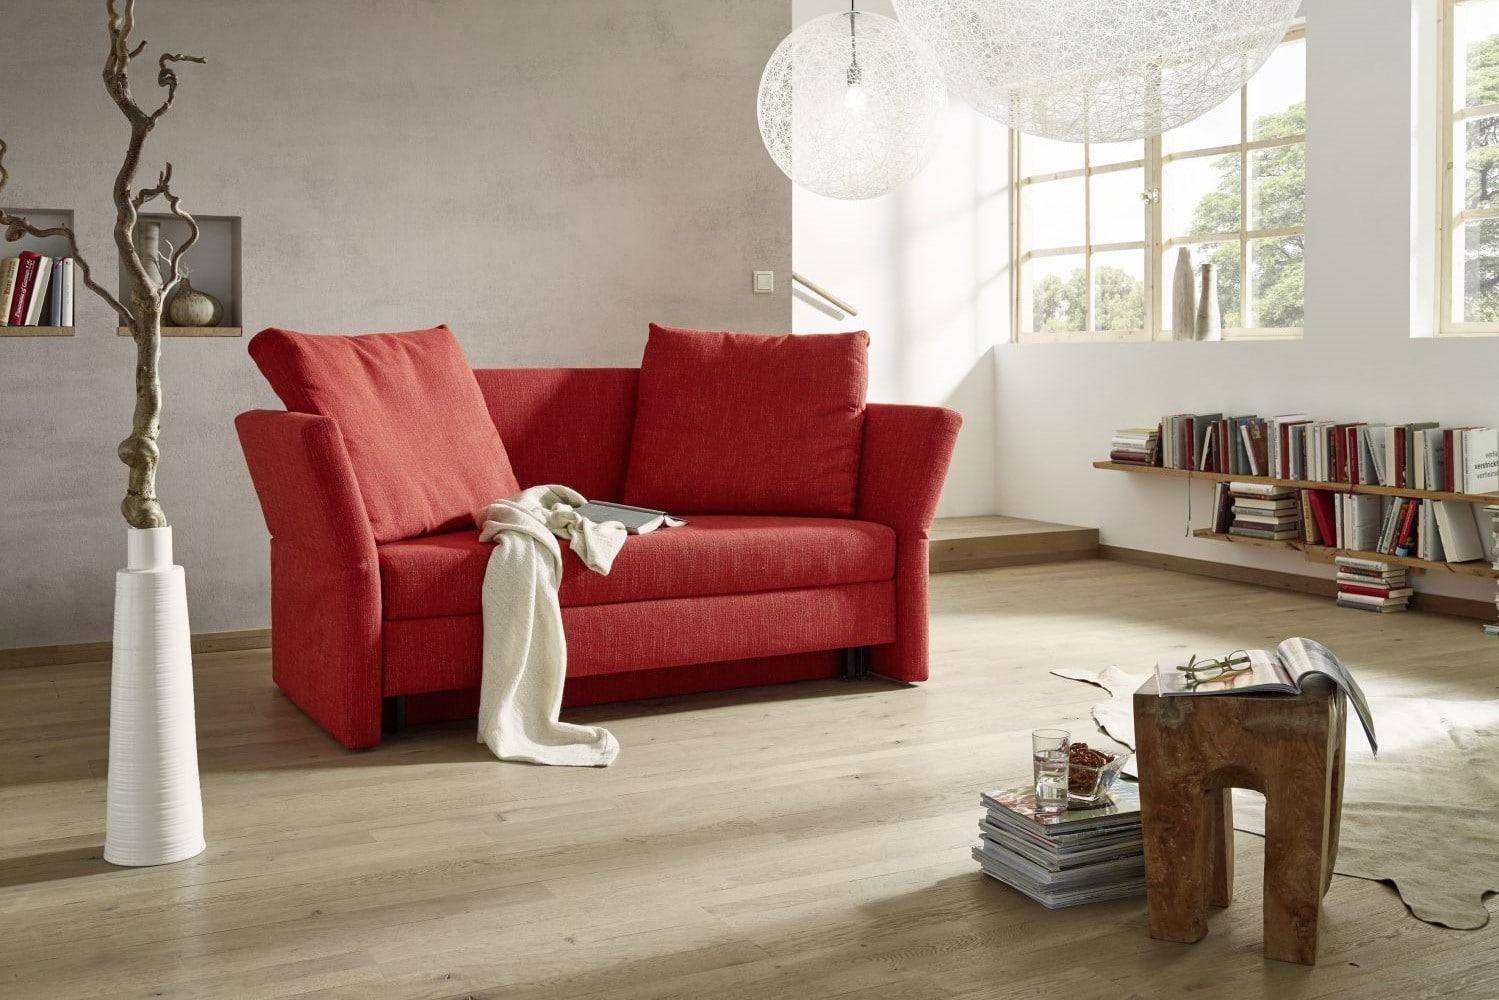 schlafsofa catania mit naturpolster wohnopposition berlin. Black Bedroom Furniture Sets. Home Design Ideas